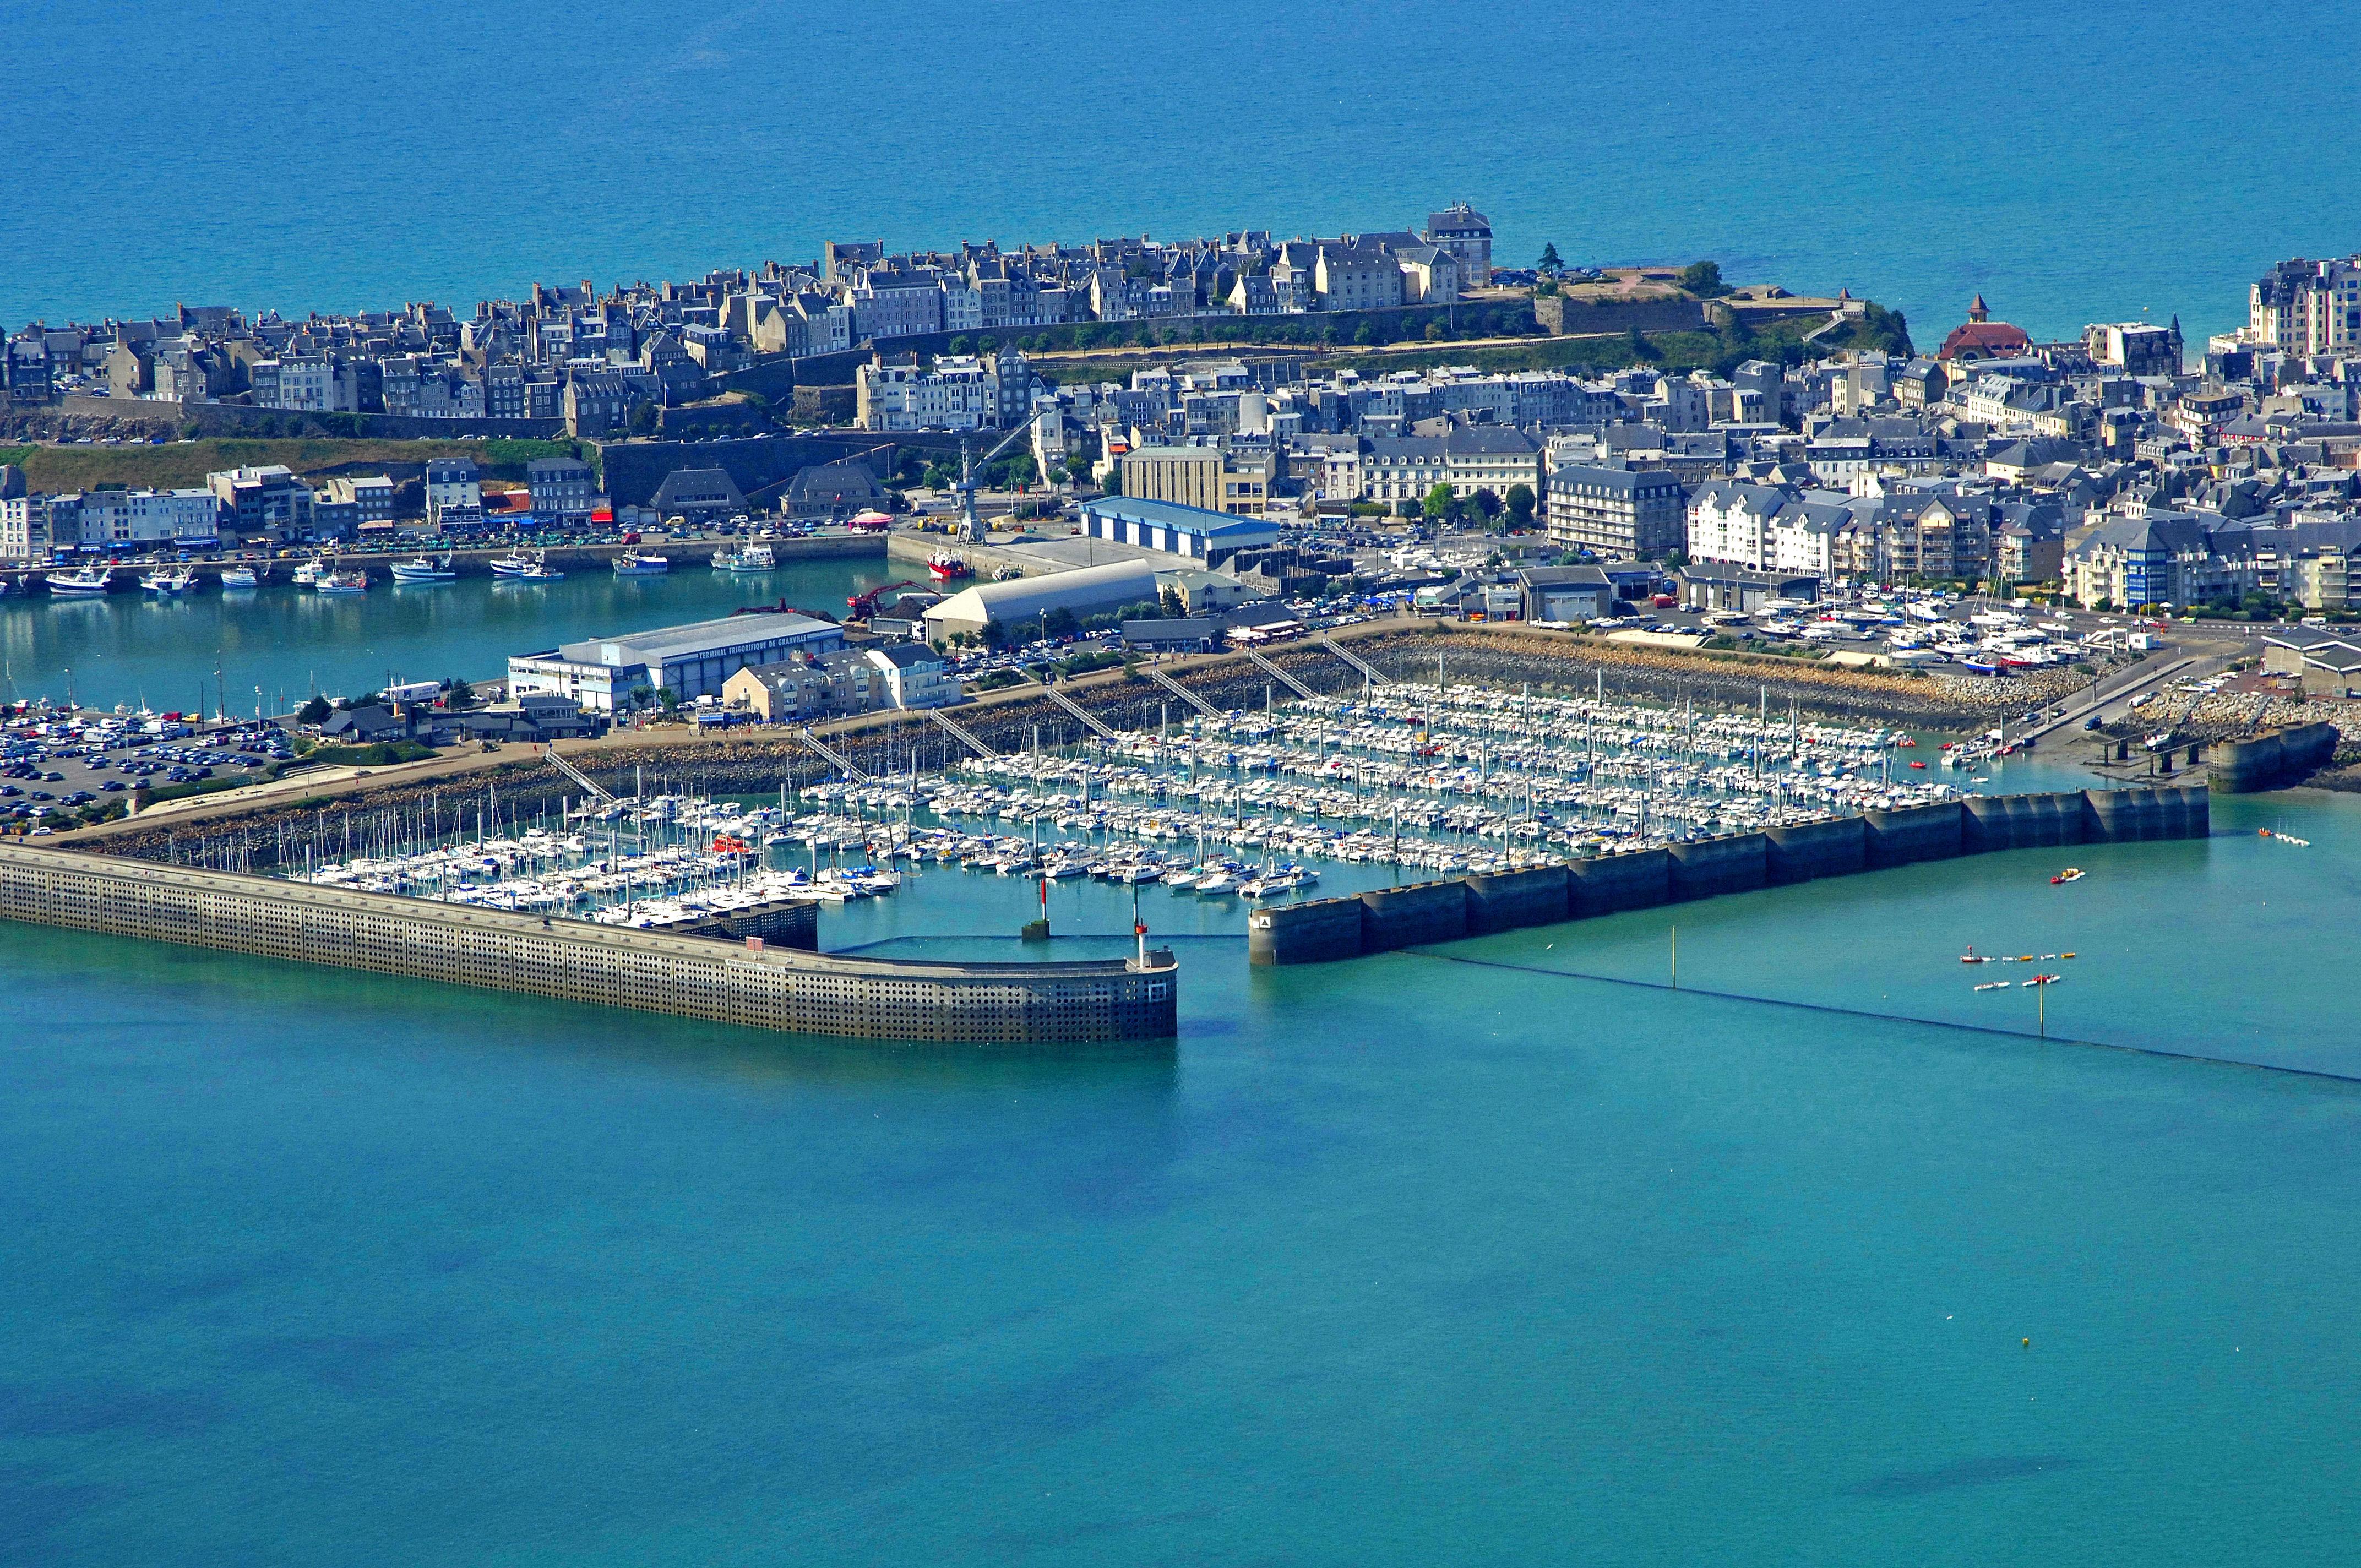 Granville Marina in Granville, Low Normandy, France - Marina Reviews